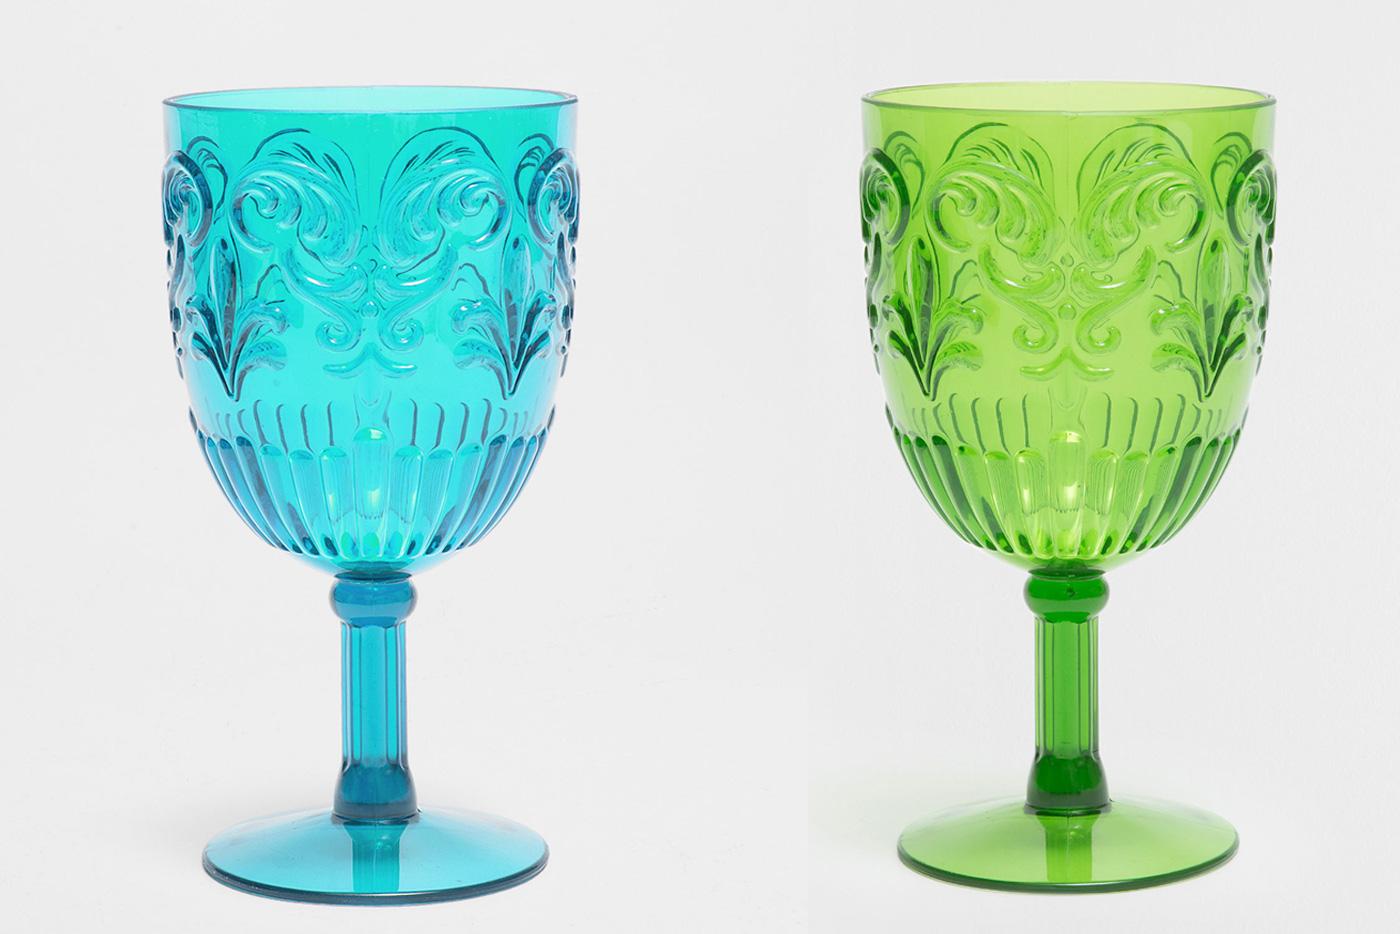 Zara-home-pic-nic-bicchieri-acrilico-img-post-6